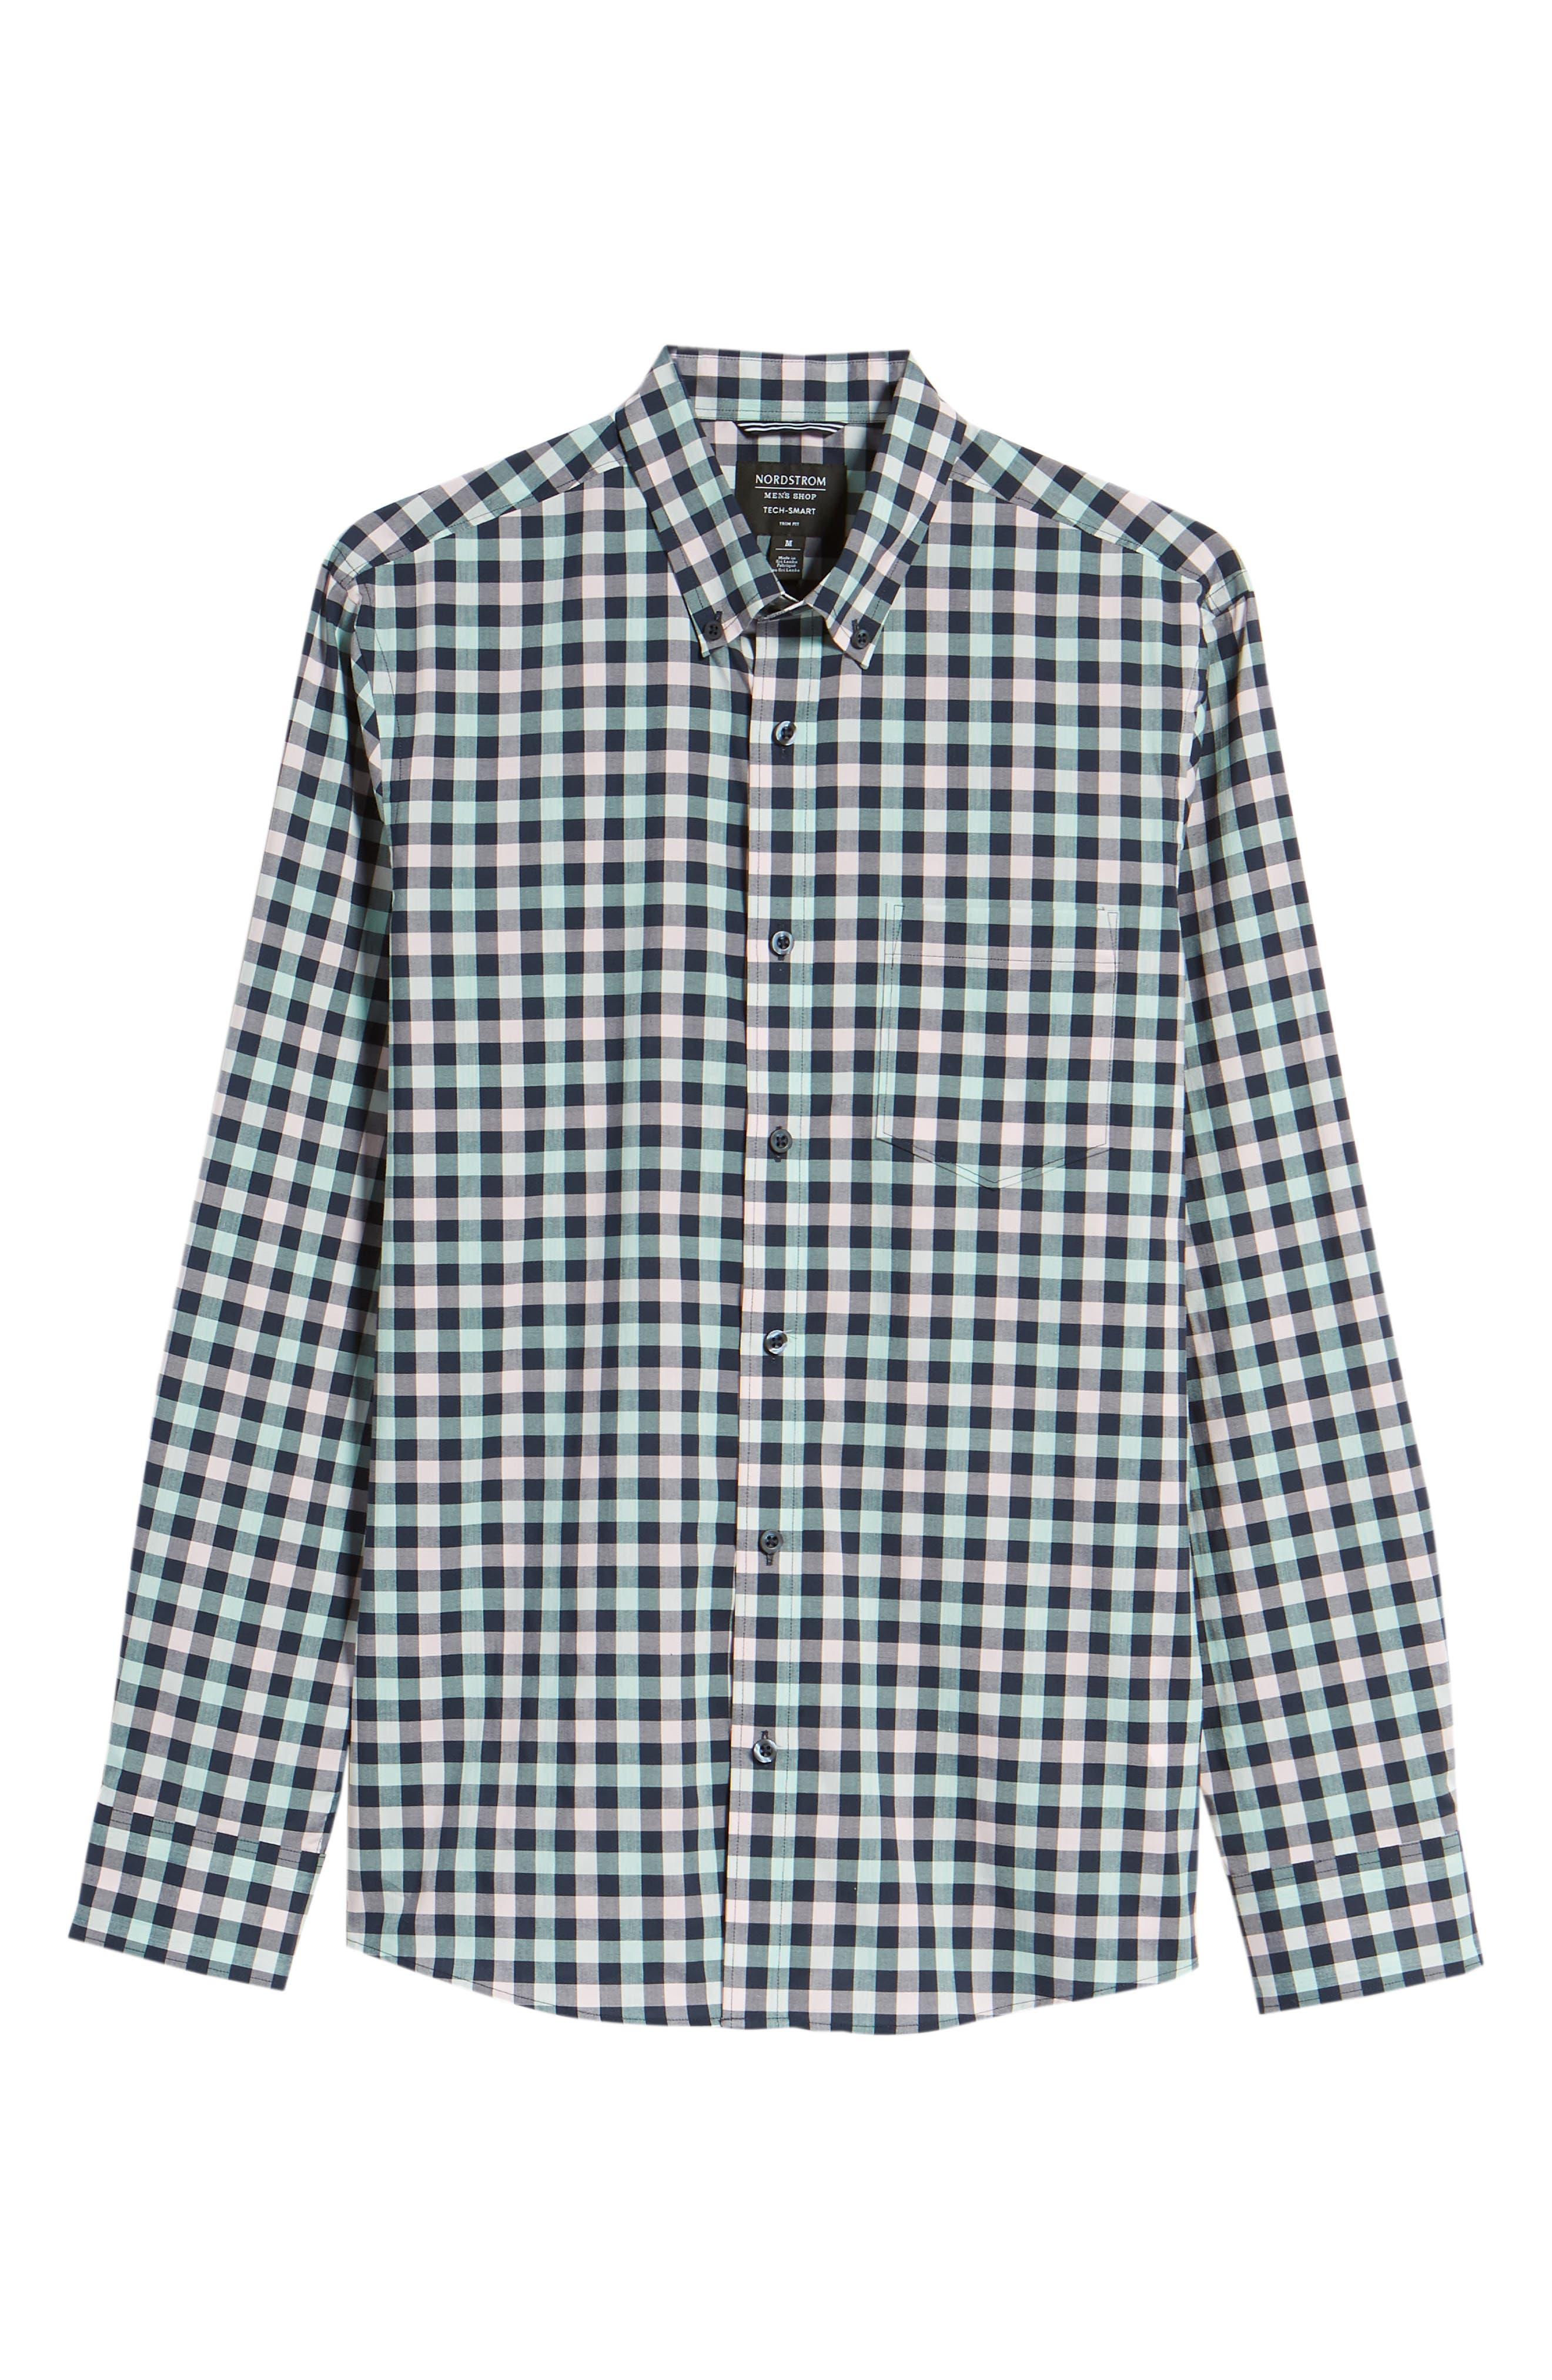 Tech-Smart Trim Fit Check Sport Shirt,                             Alternate thumbnail 6, color,                             Navy Iris Teal Check